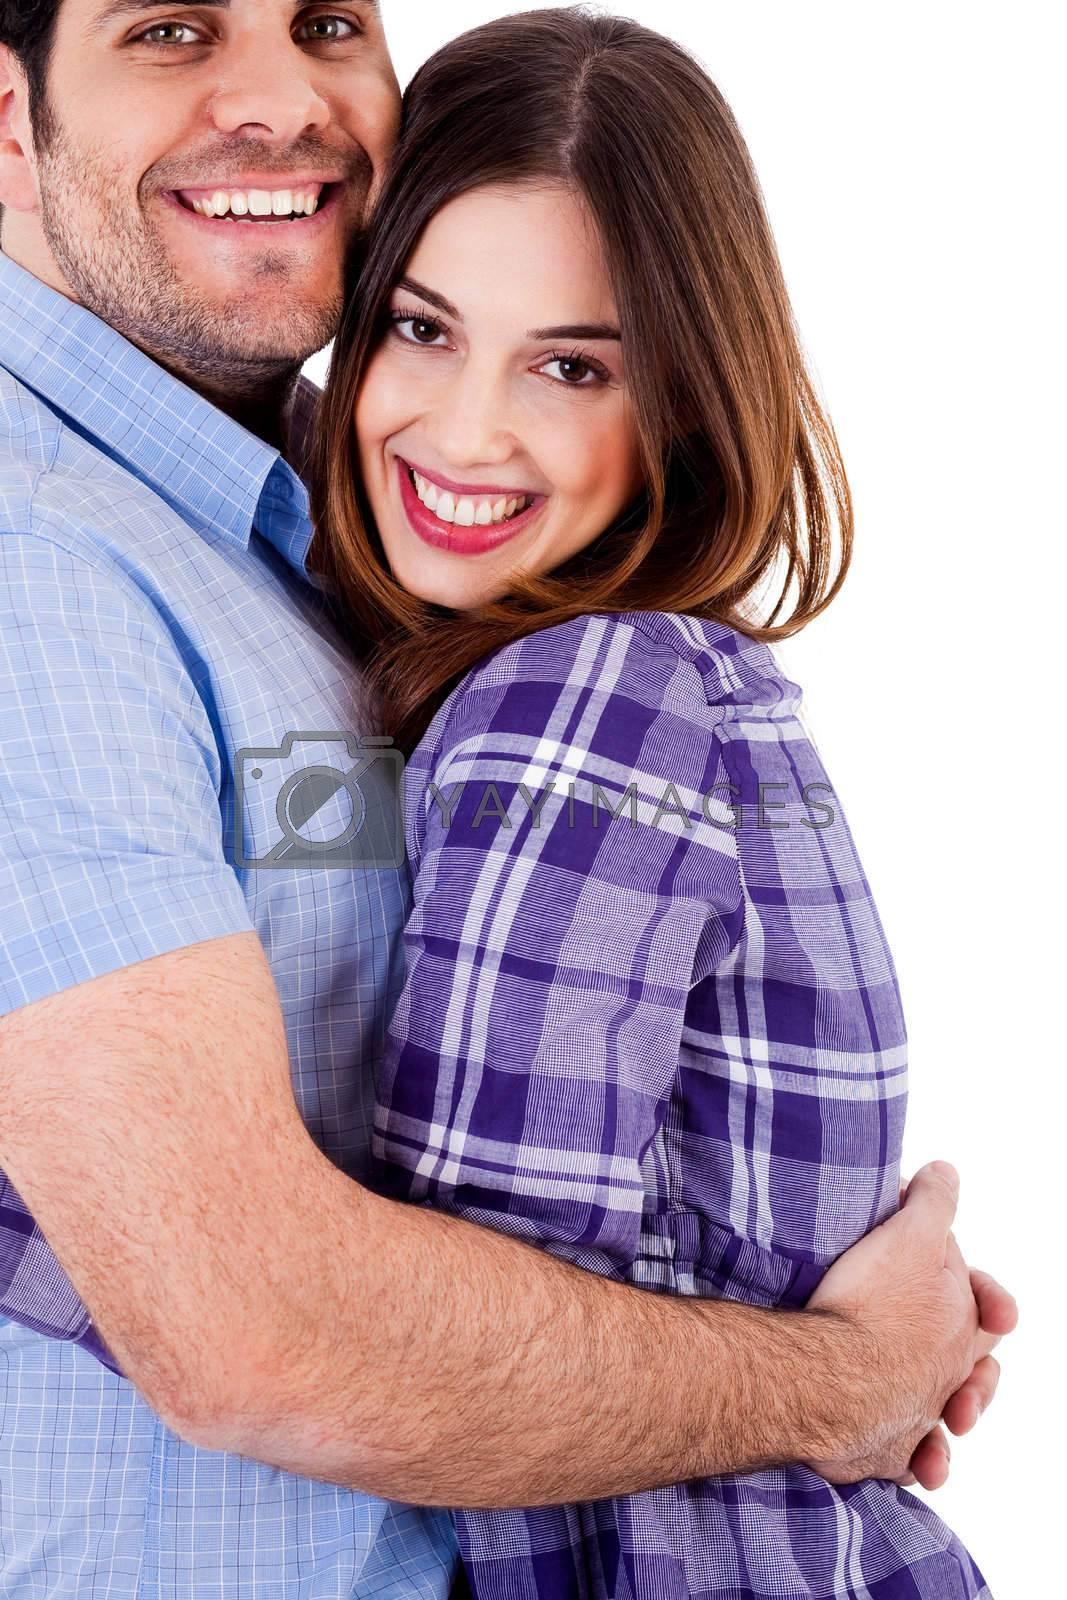 closeup view of young man hugging woman